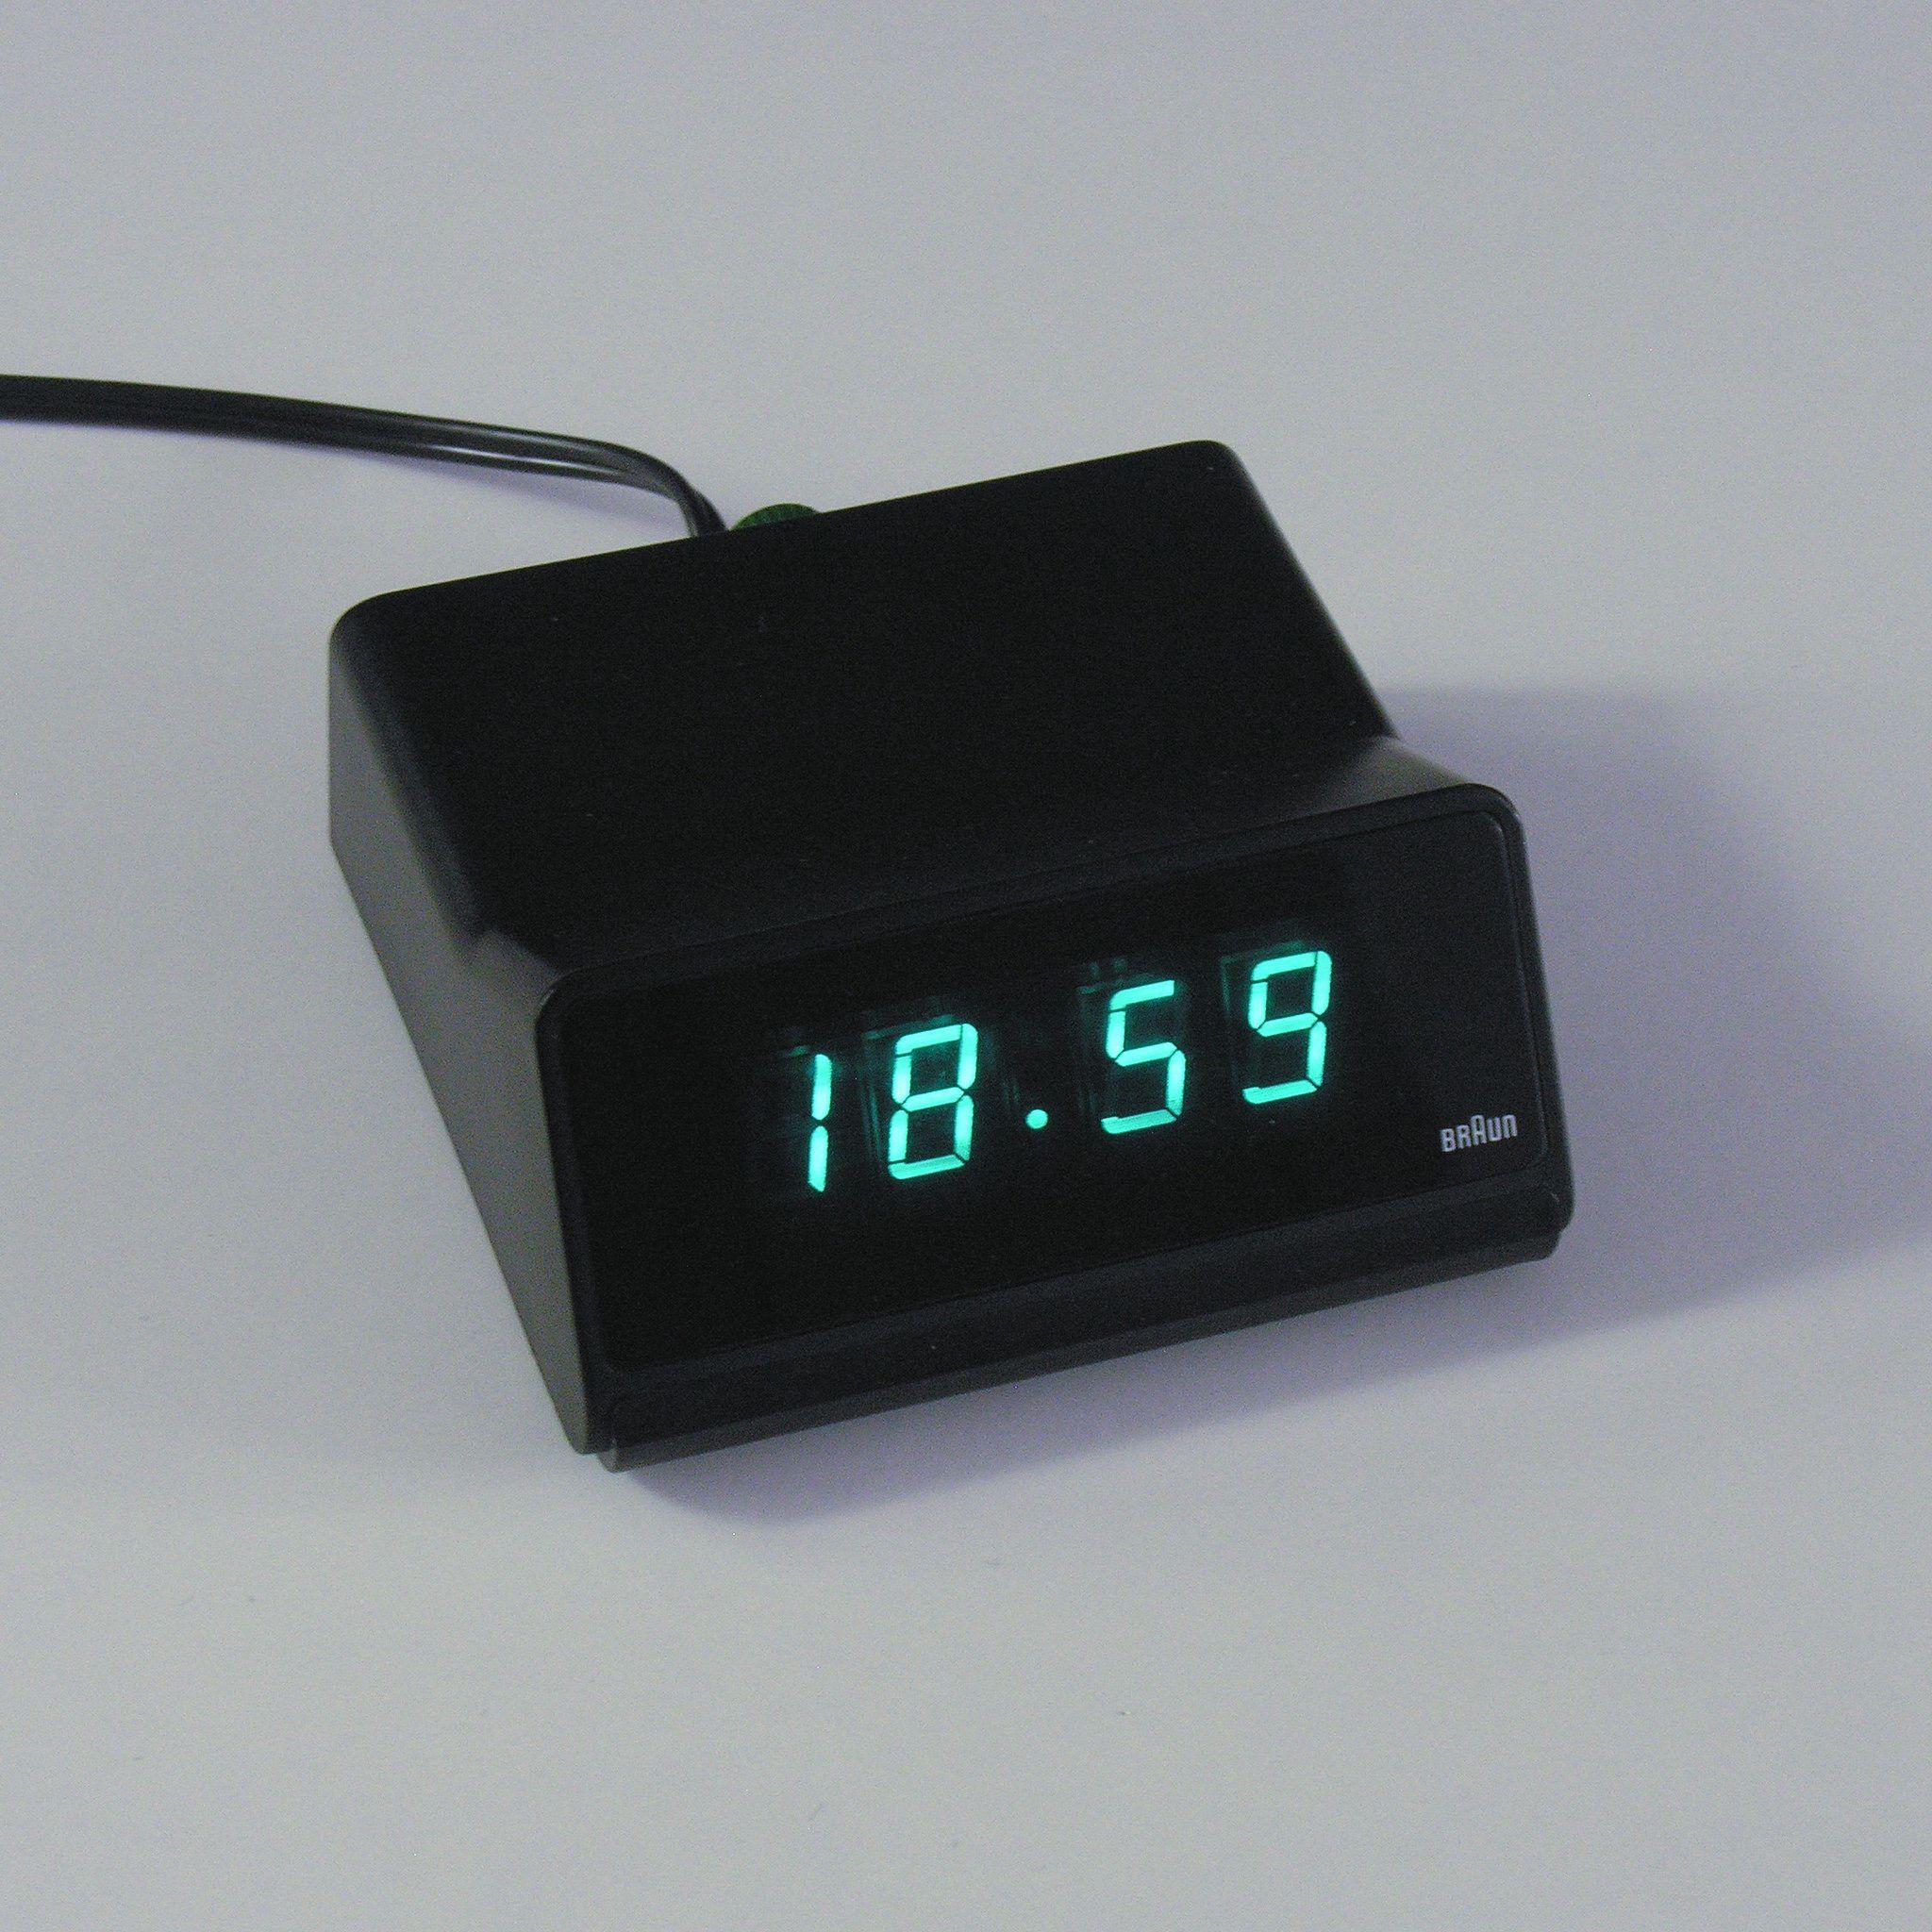 Braun Dn 40 Alarm Clock Alarm Clock Alarm Clock Design Braun Design